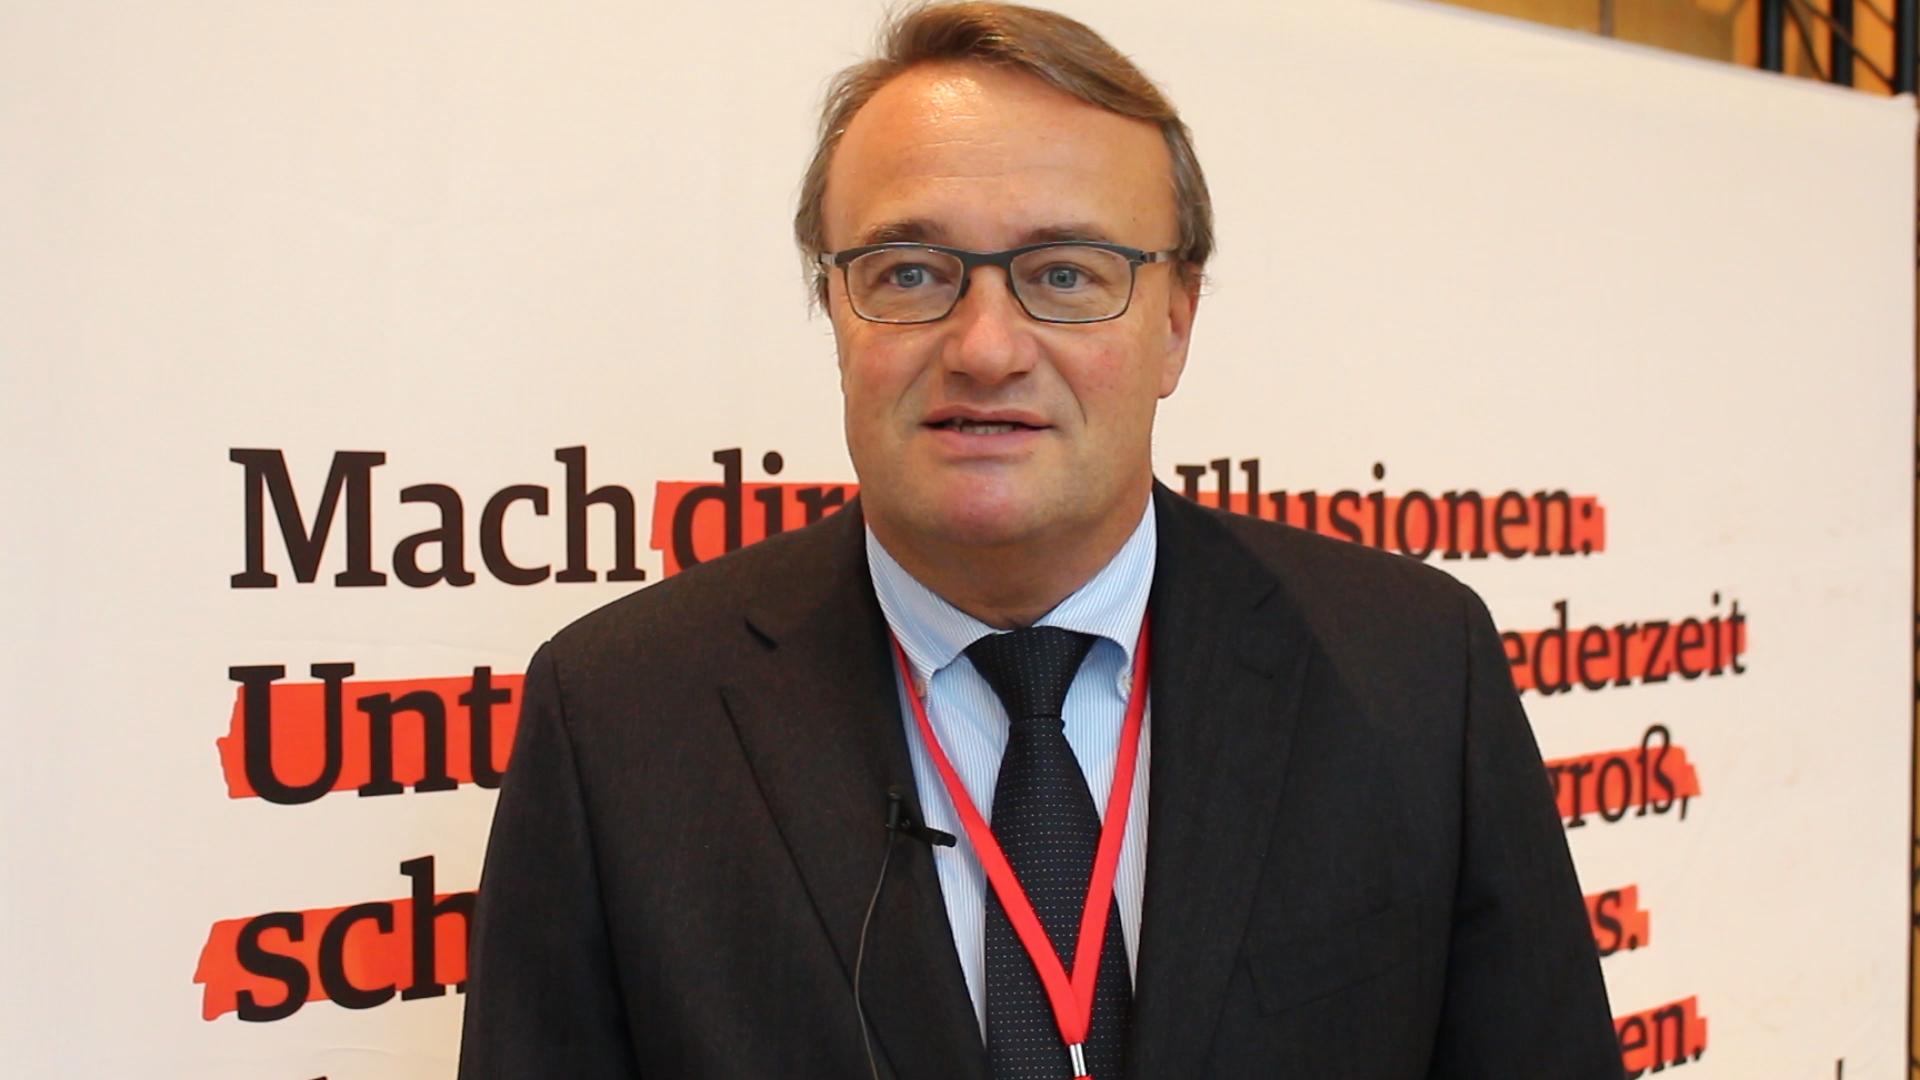 Rolf Heinecke